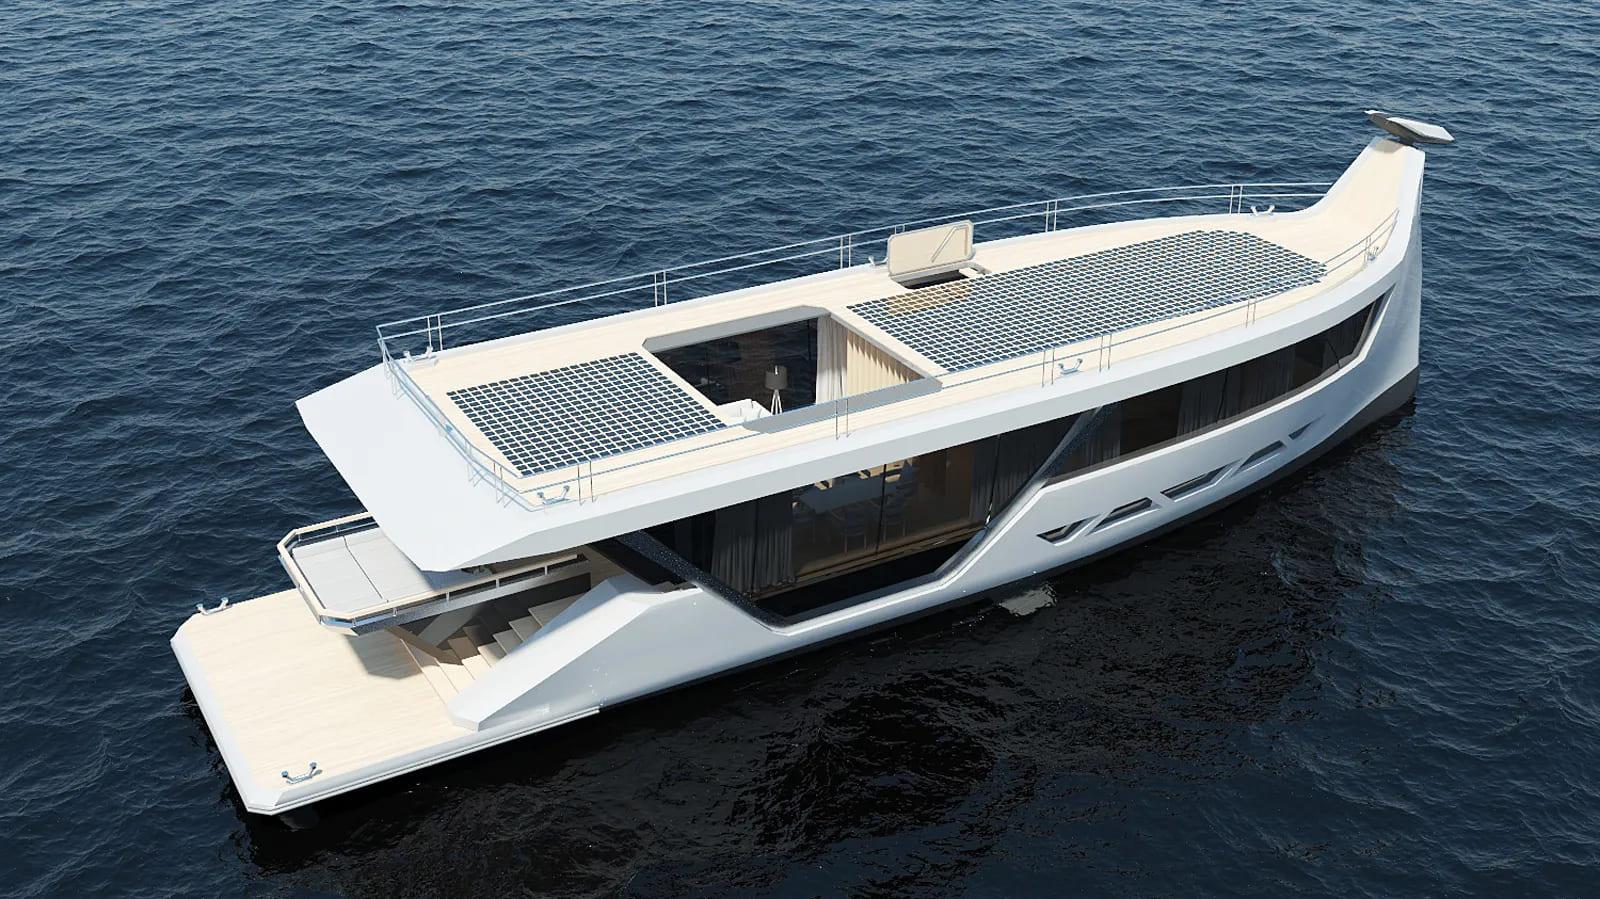 Drakkar S iate conceito - boat shopping